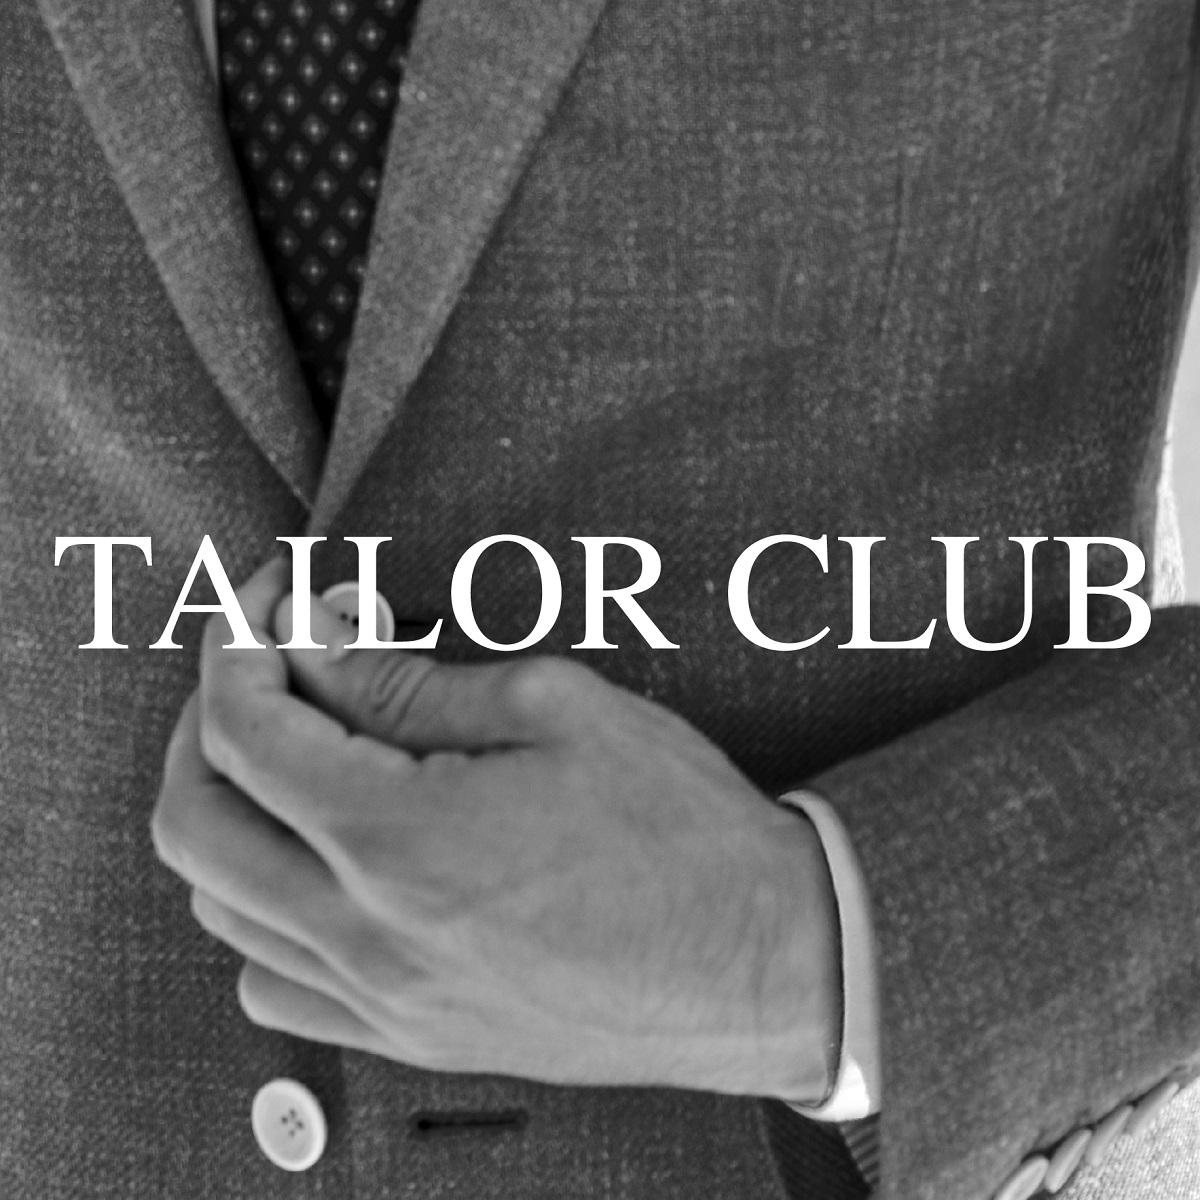 Tailor Club